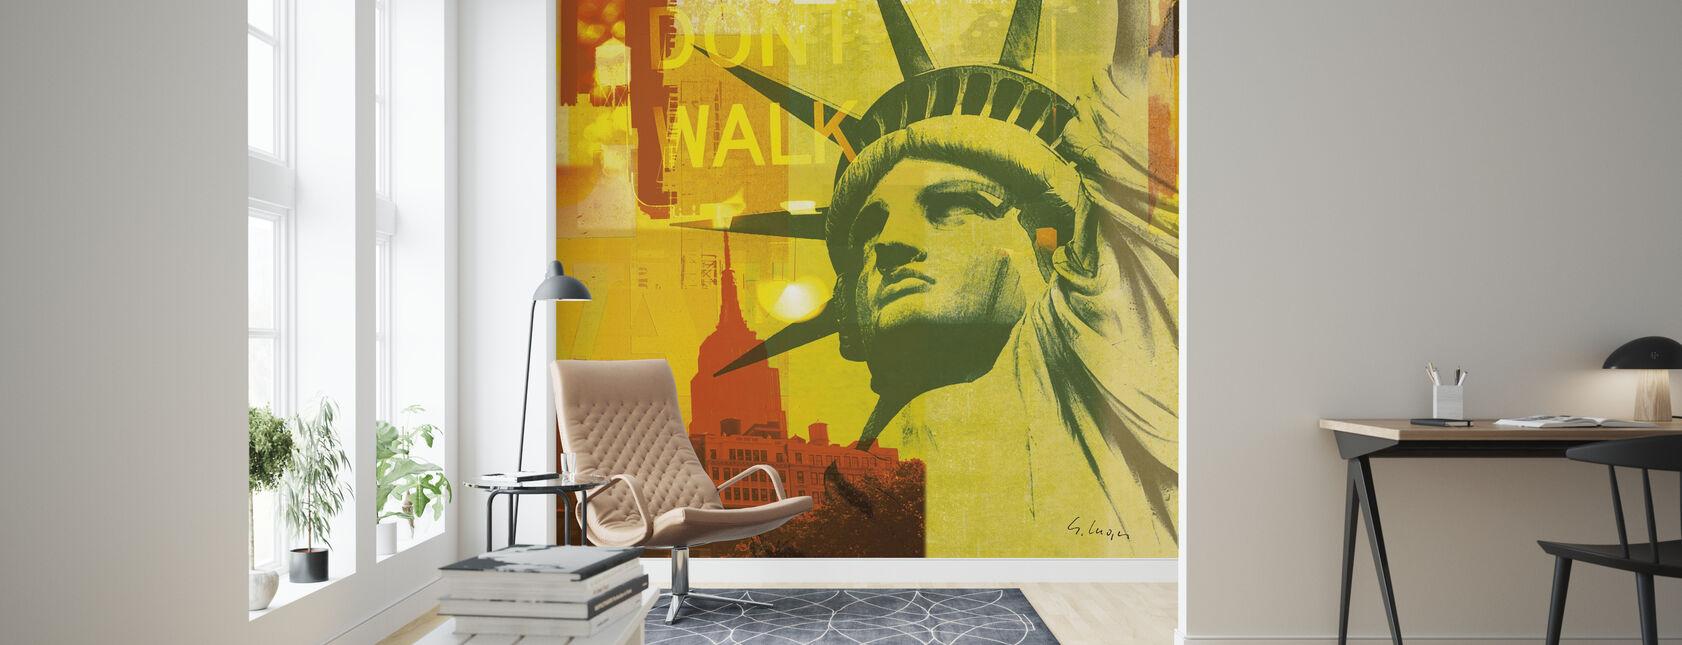 New York Dont Walk III - Tapet - Stue